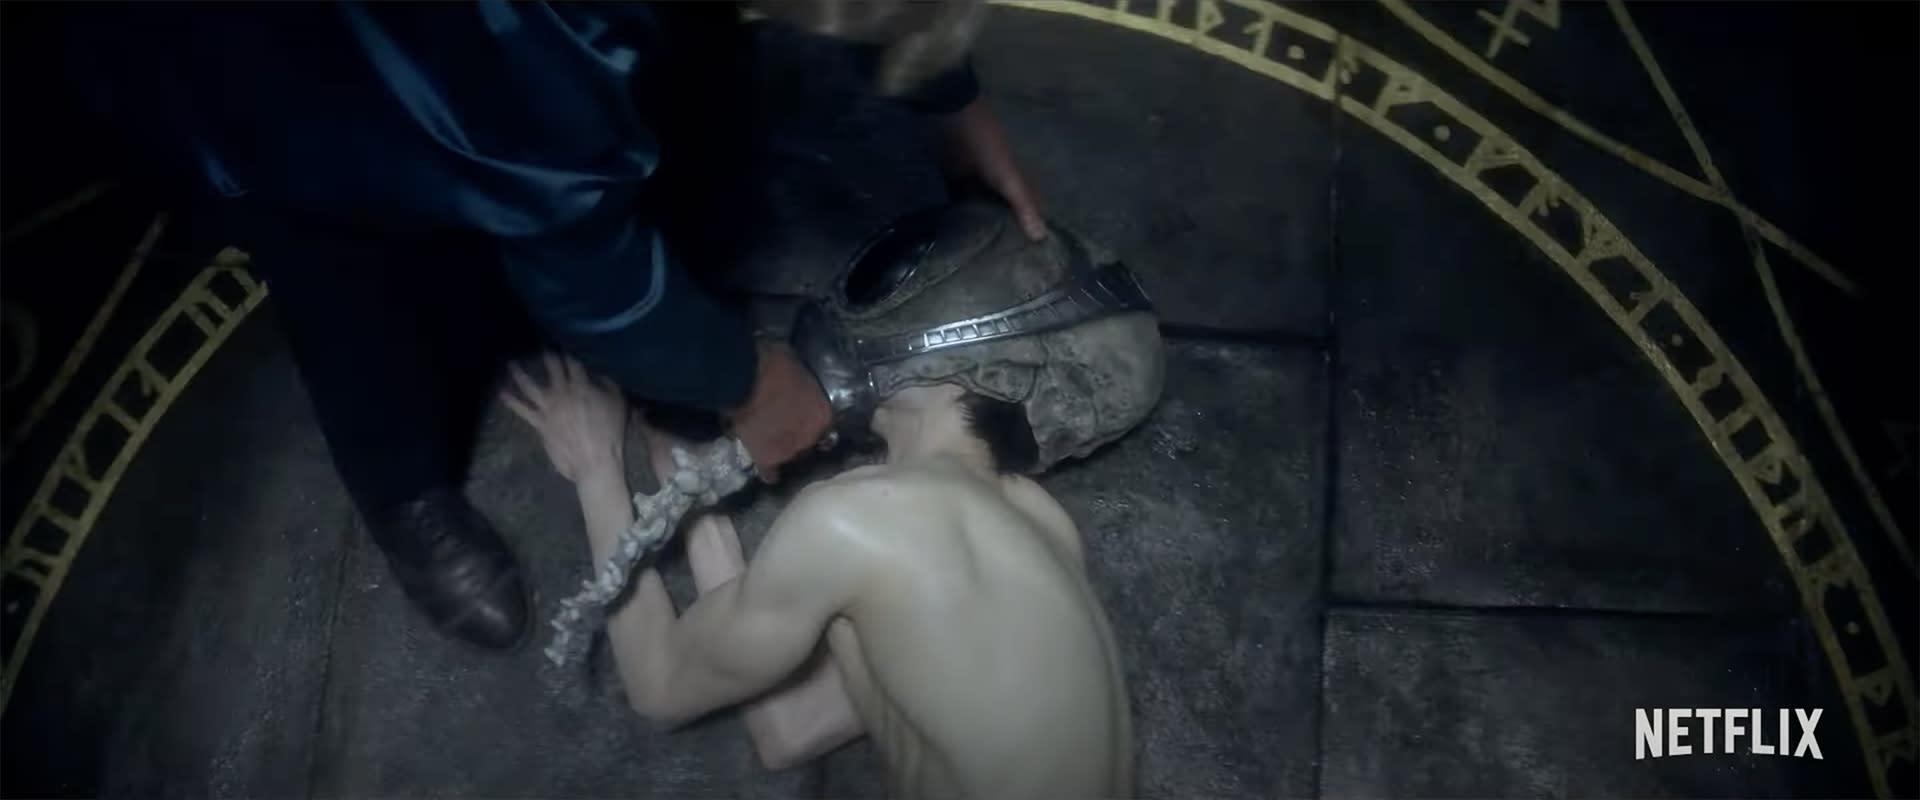 'The Sandman' teaser for Netflix shows the capture of Morpheus